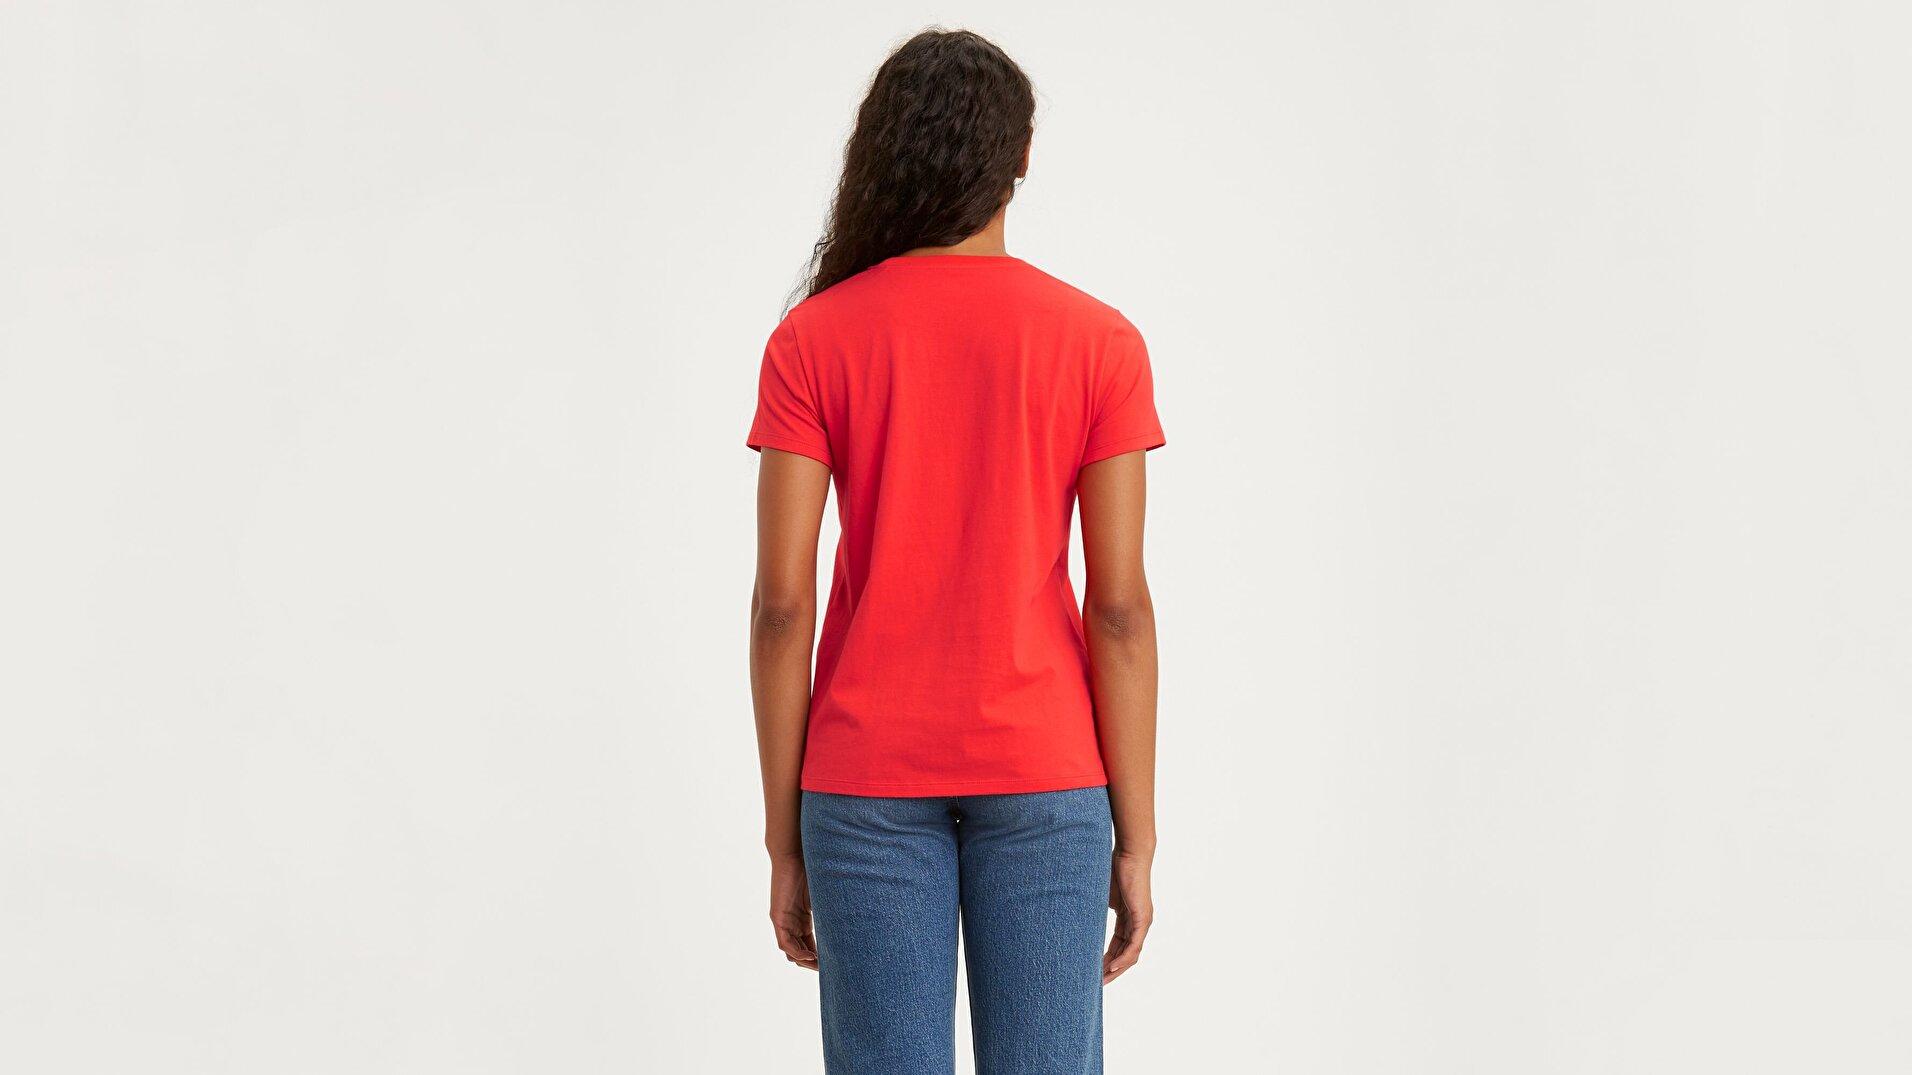 The Perfect Tee Bw T2 Kırmızı Kadın Tişört